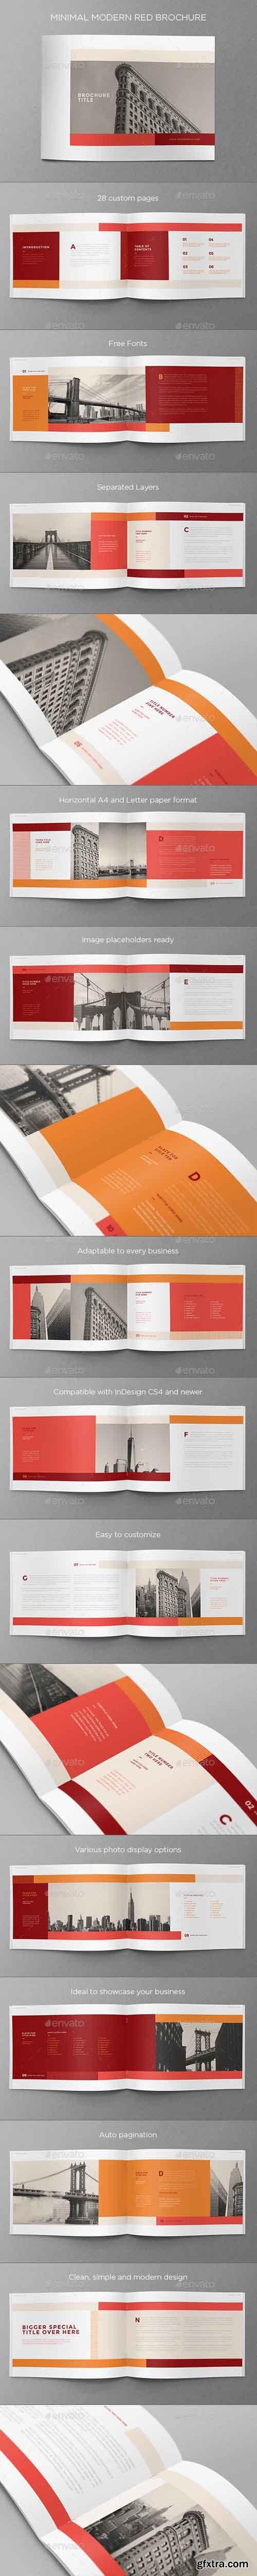 GR - Minimal Modern Red Brochure 15107153